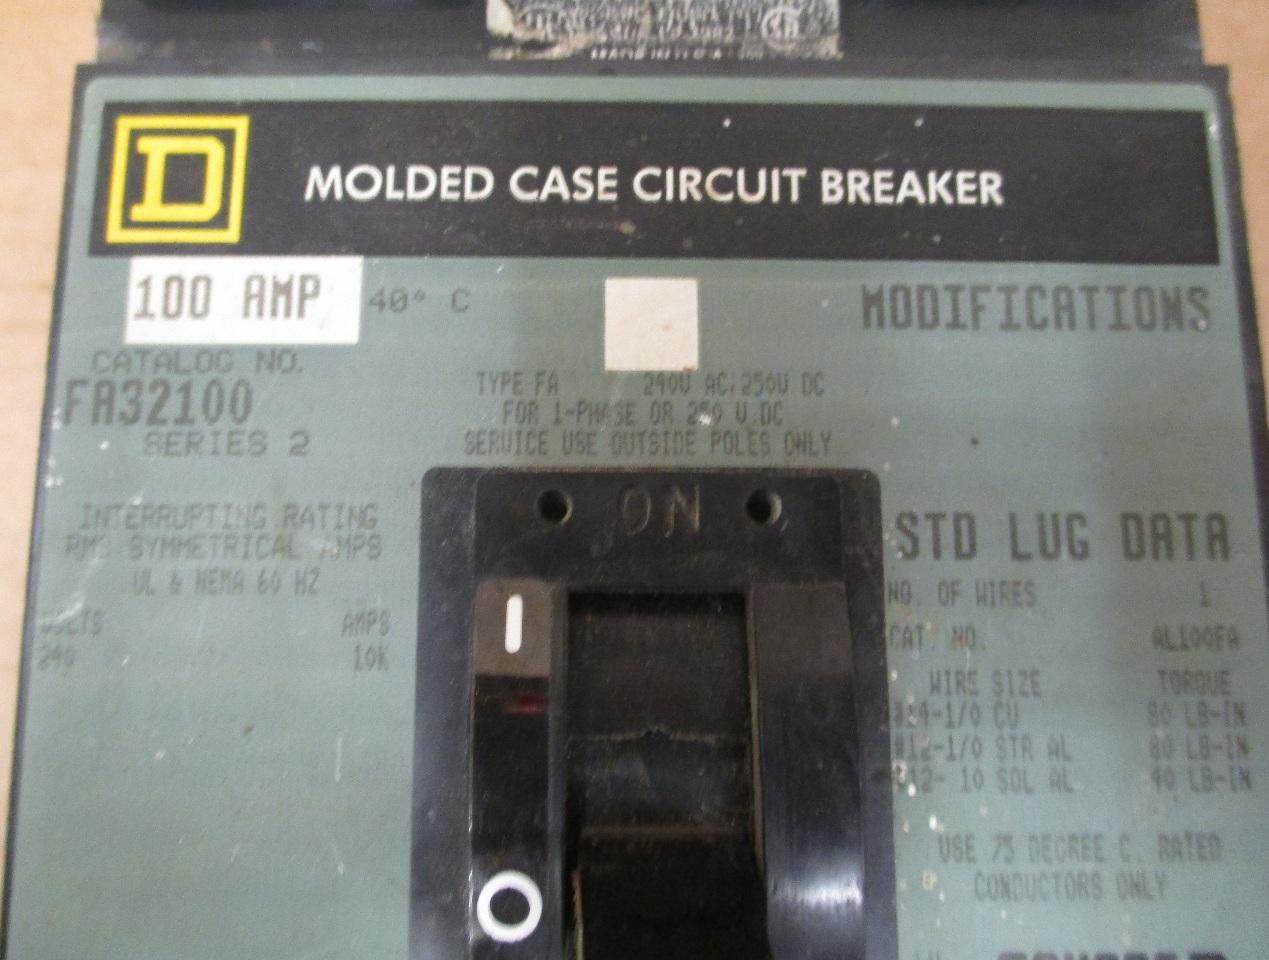 Details About Square D Fa32100 3 Pole 100 Amp Circuit Breaker Series 2